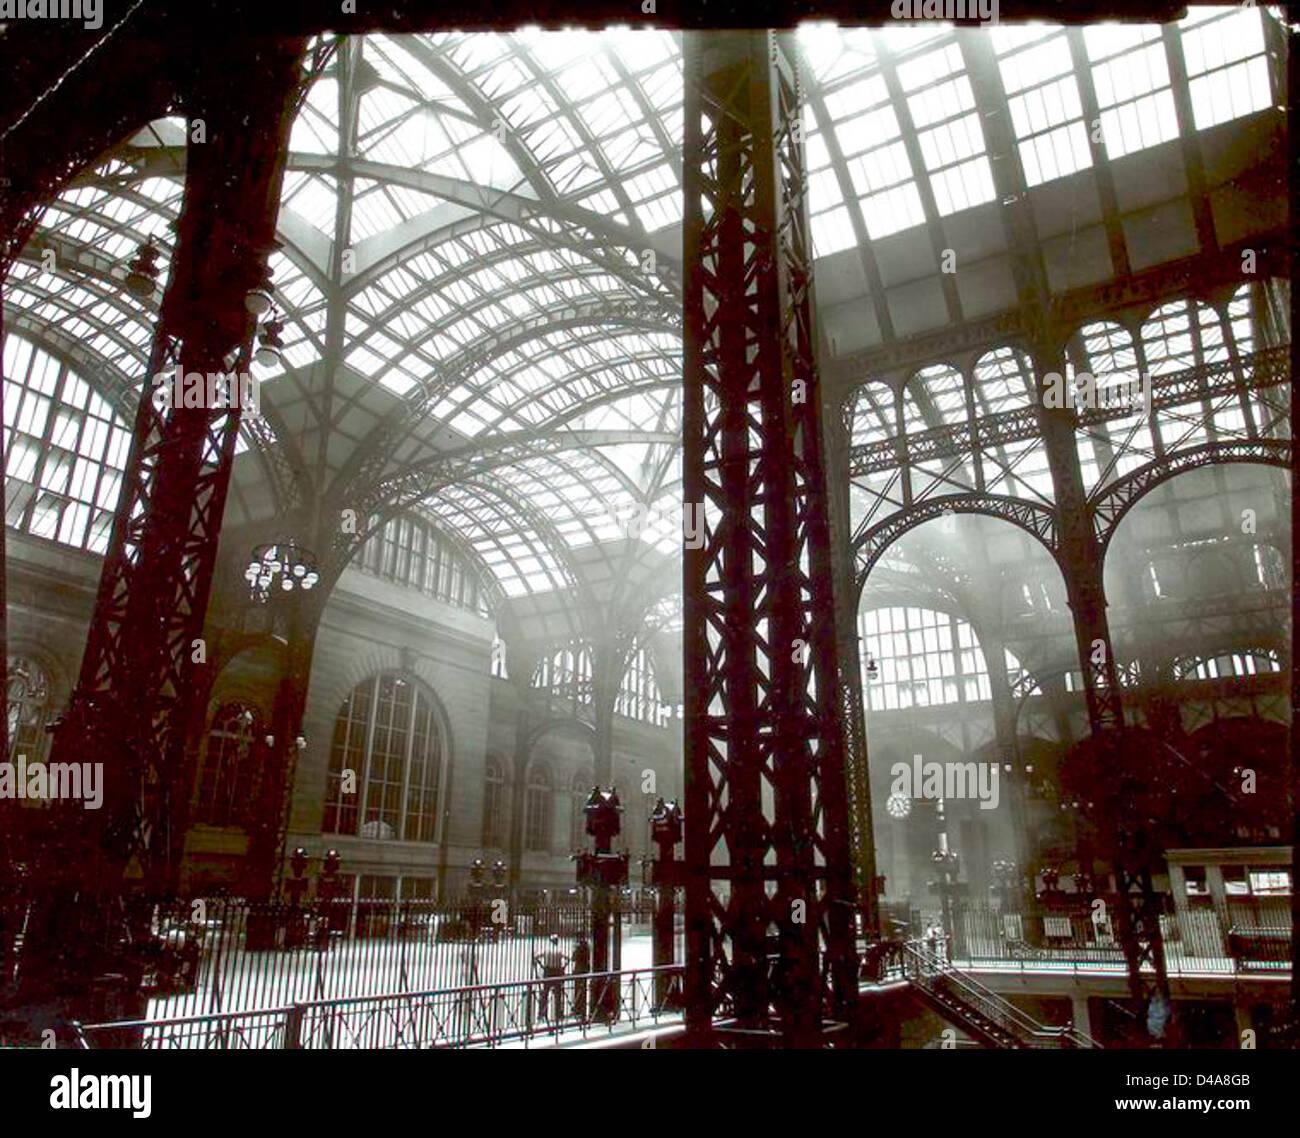 Penn Station, Interior, Manhattan. - Stock Image